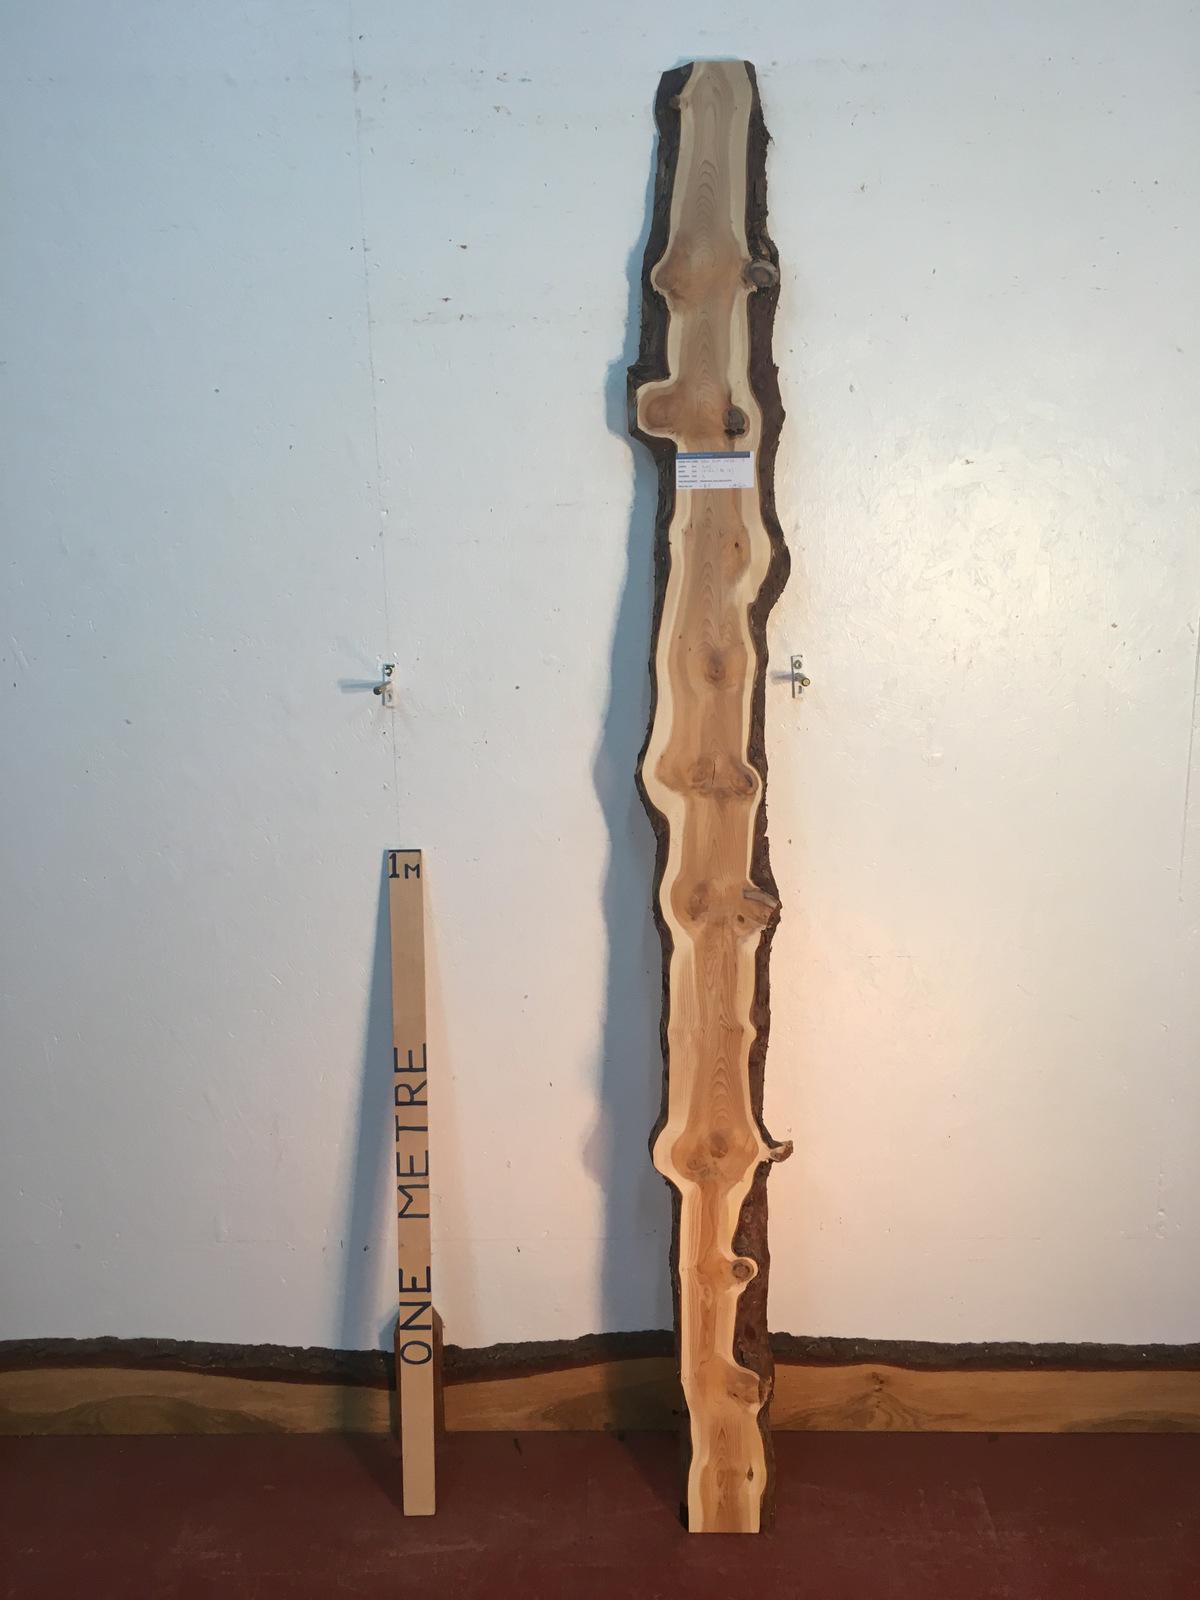 YEW Natural Waney Live Edge Slab Wood Board 1437C-2